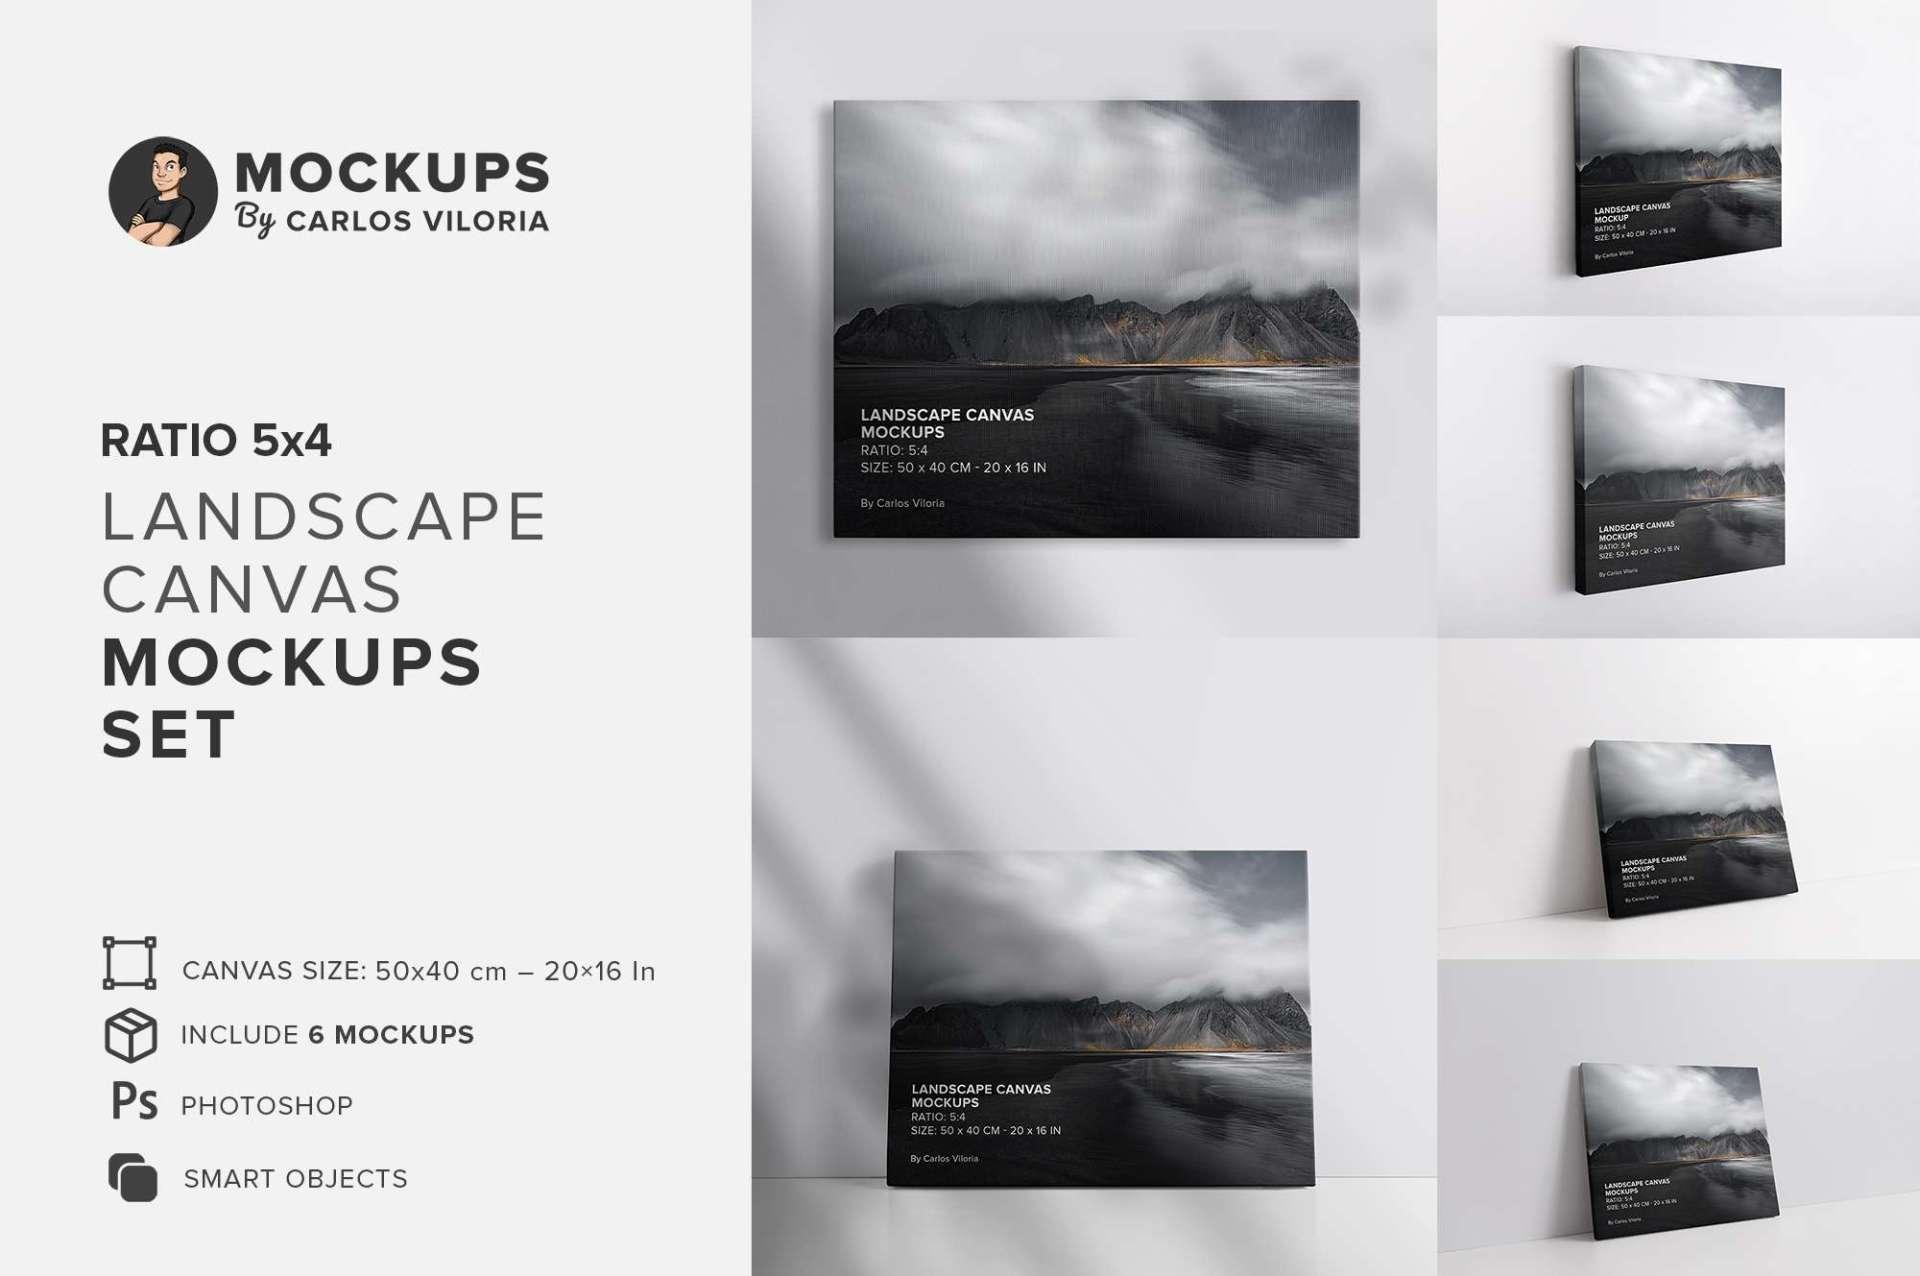 Landscape Ratio 5x4 Canvas Mockups